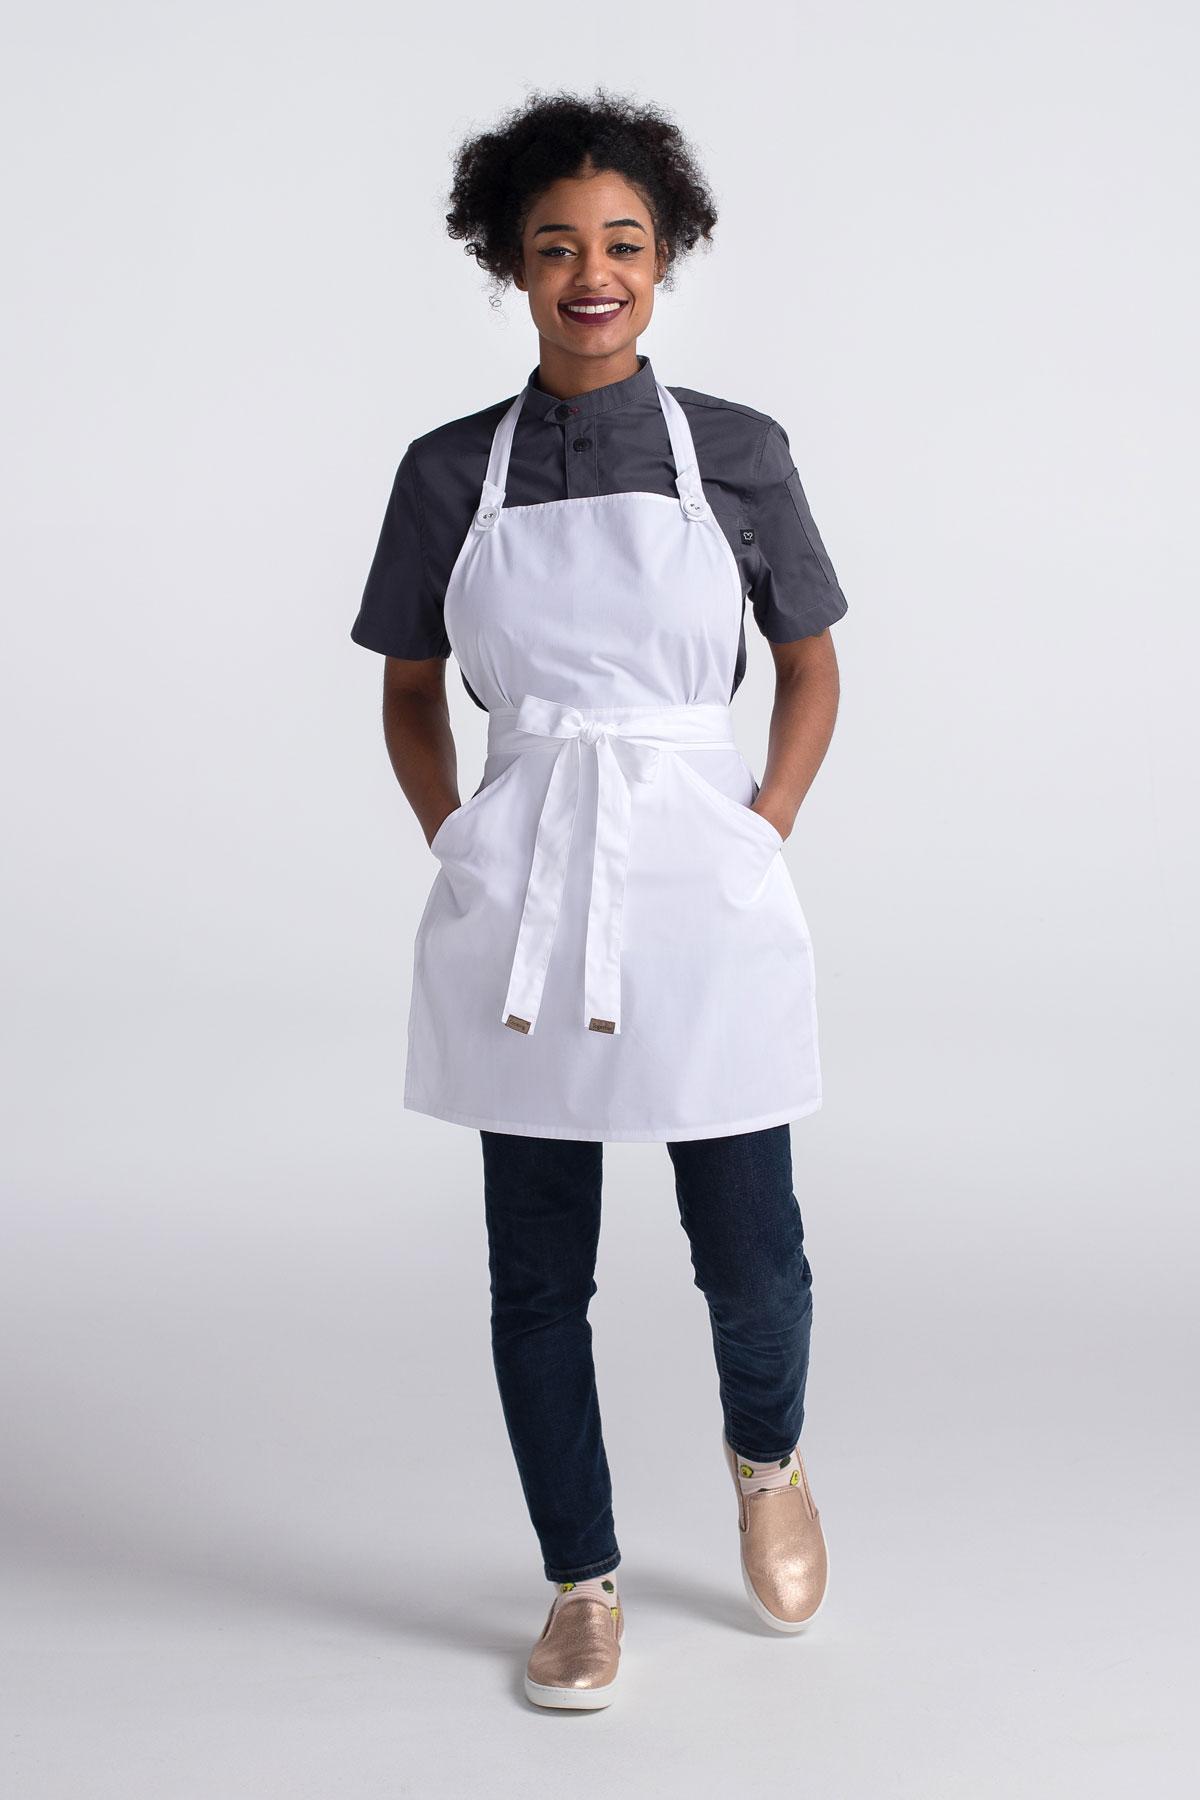 Women's Adjustable Neck Bib Apron With Kangaroo Pocket (CW1667)